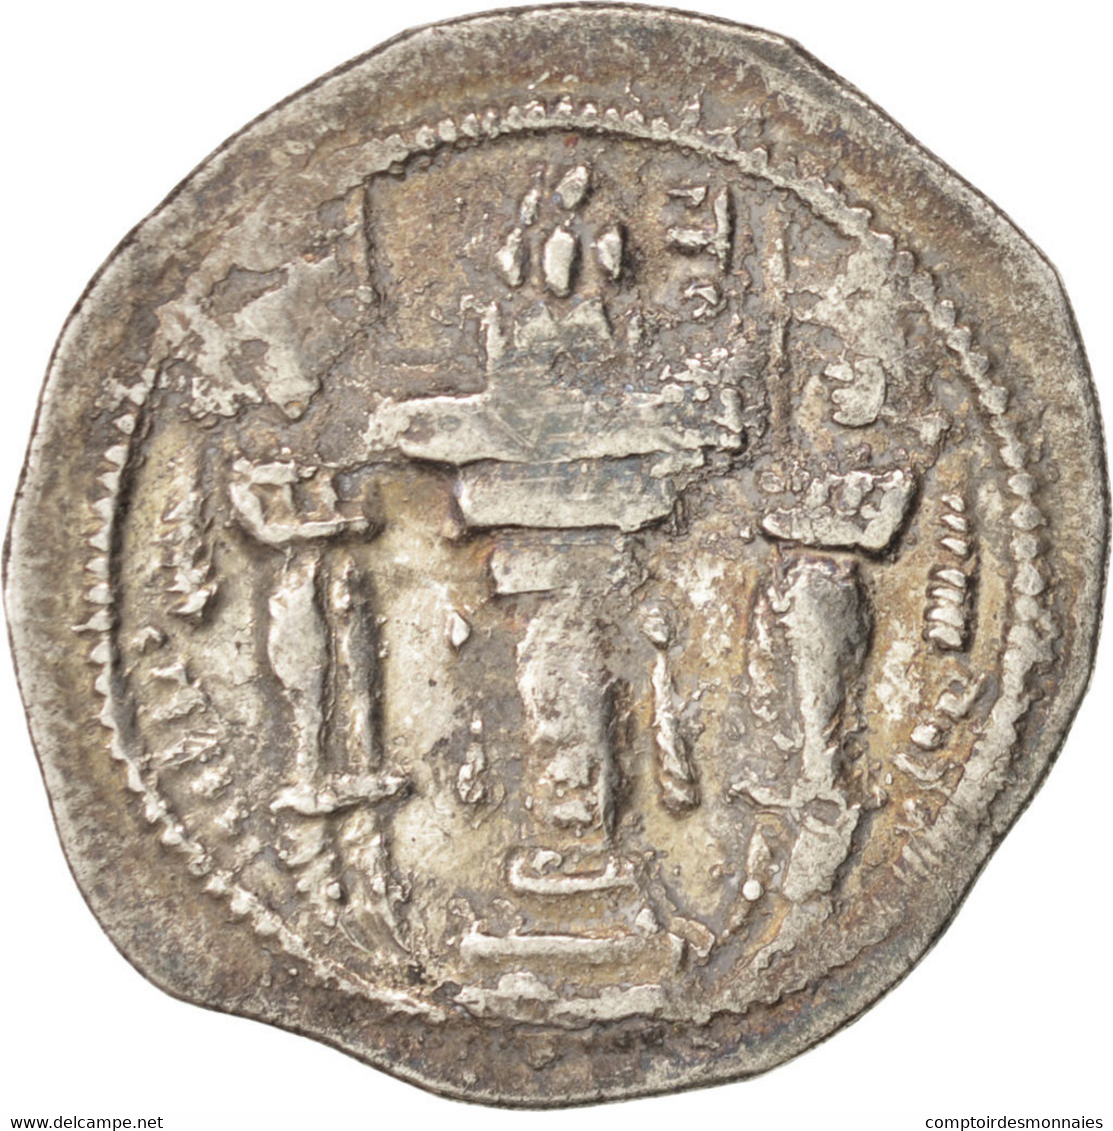 Sassanides, Yazdgard Ier (390-420), Drachme, Göbl 146-147 - Orientales